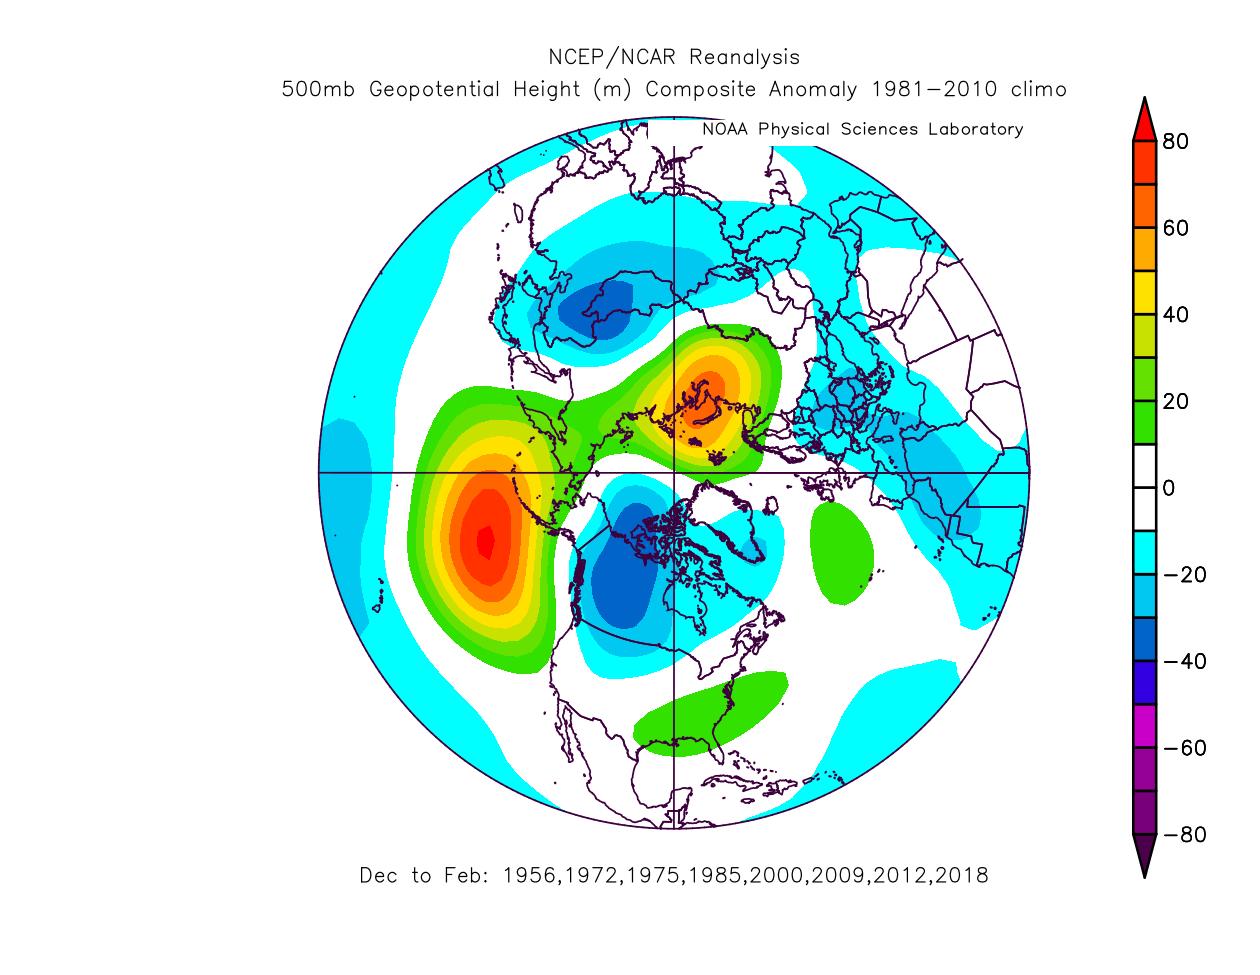 second-year-la-nina-winter-weather-pattern-reanalysis